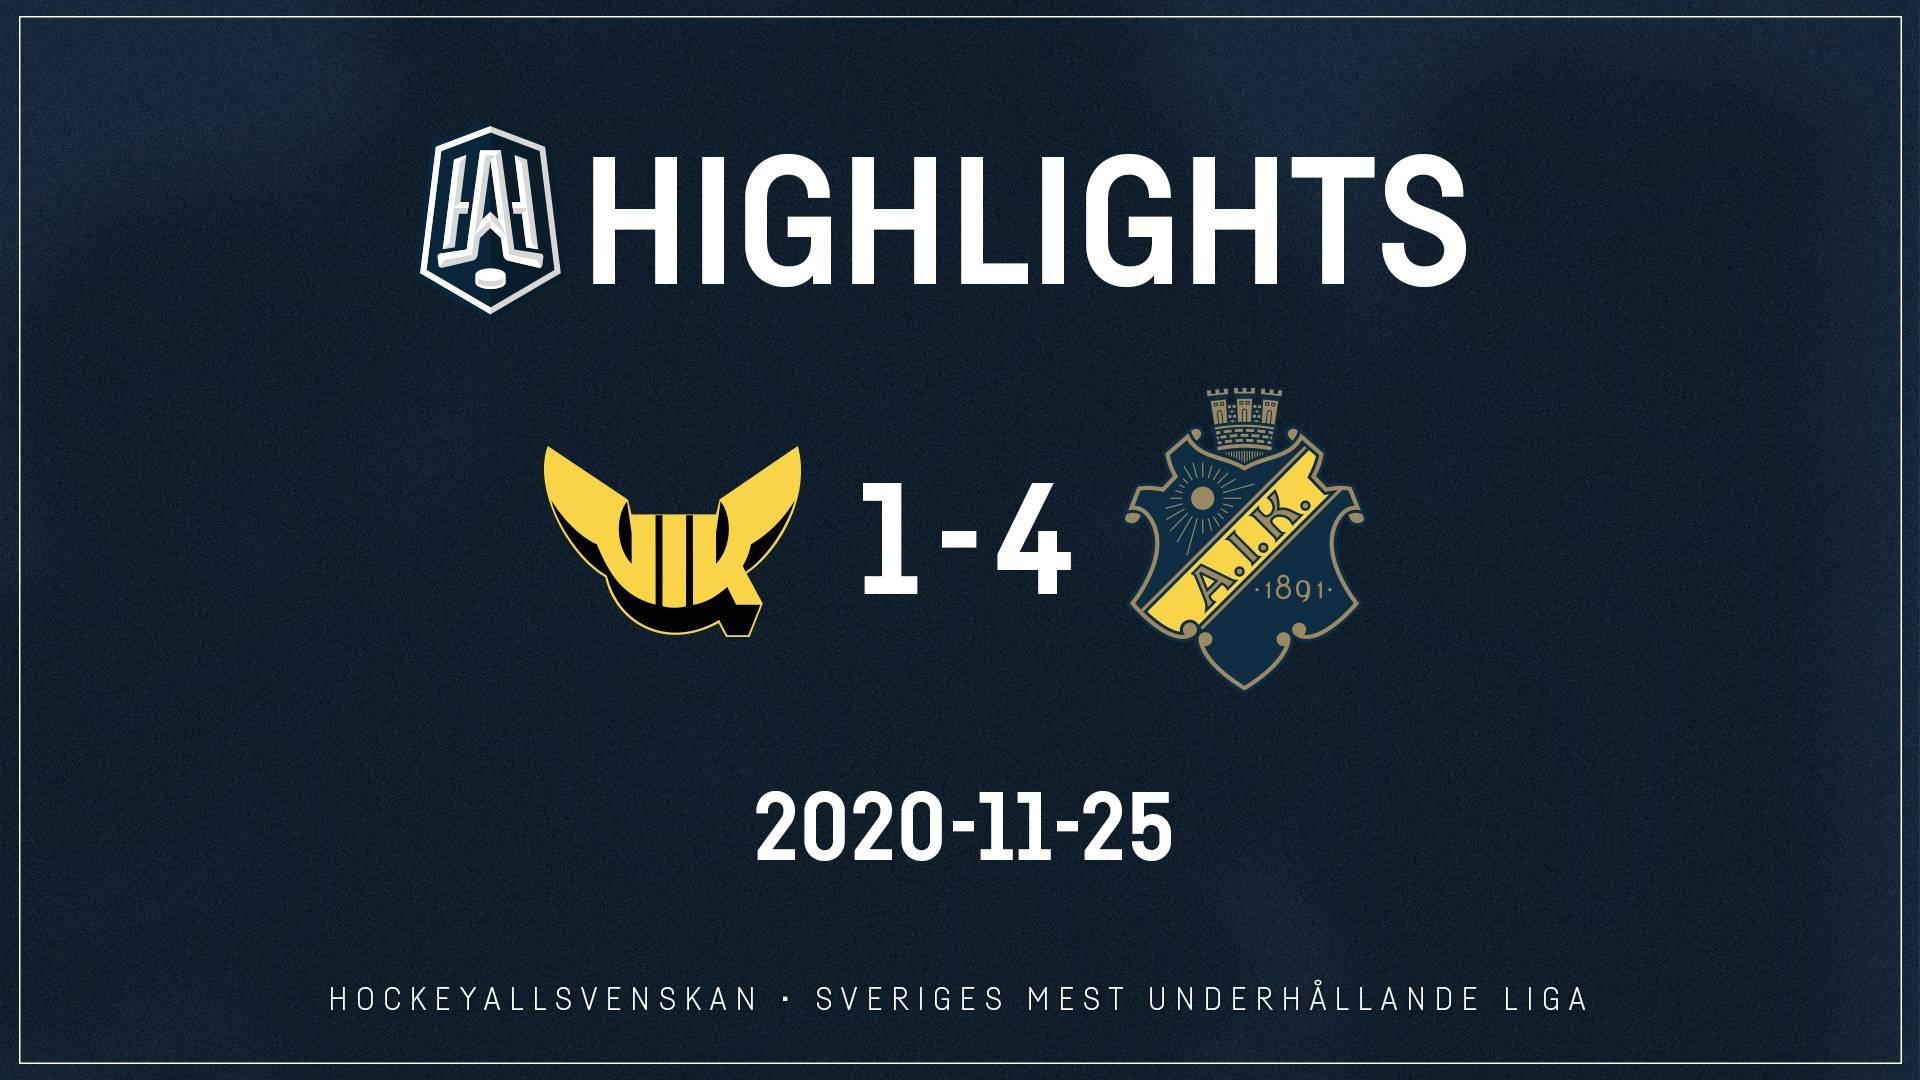 2020-11-25 Västerås - AIK 1-4